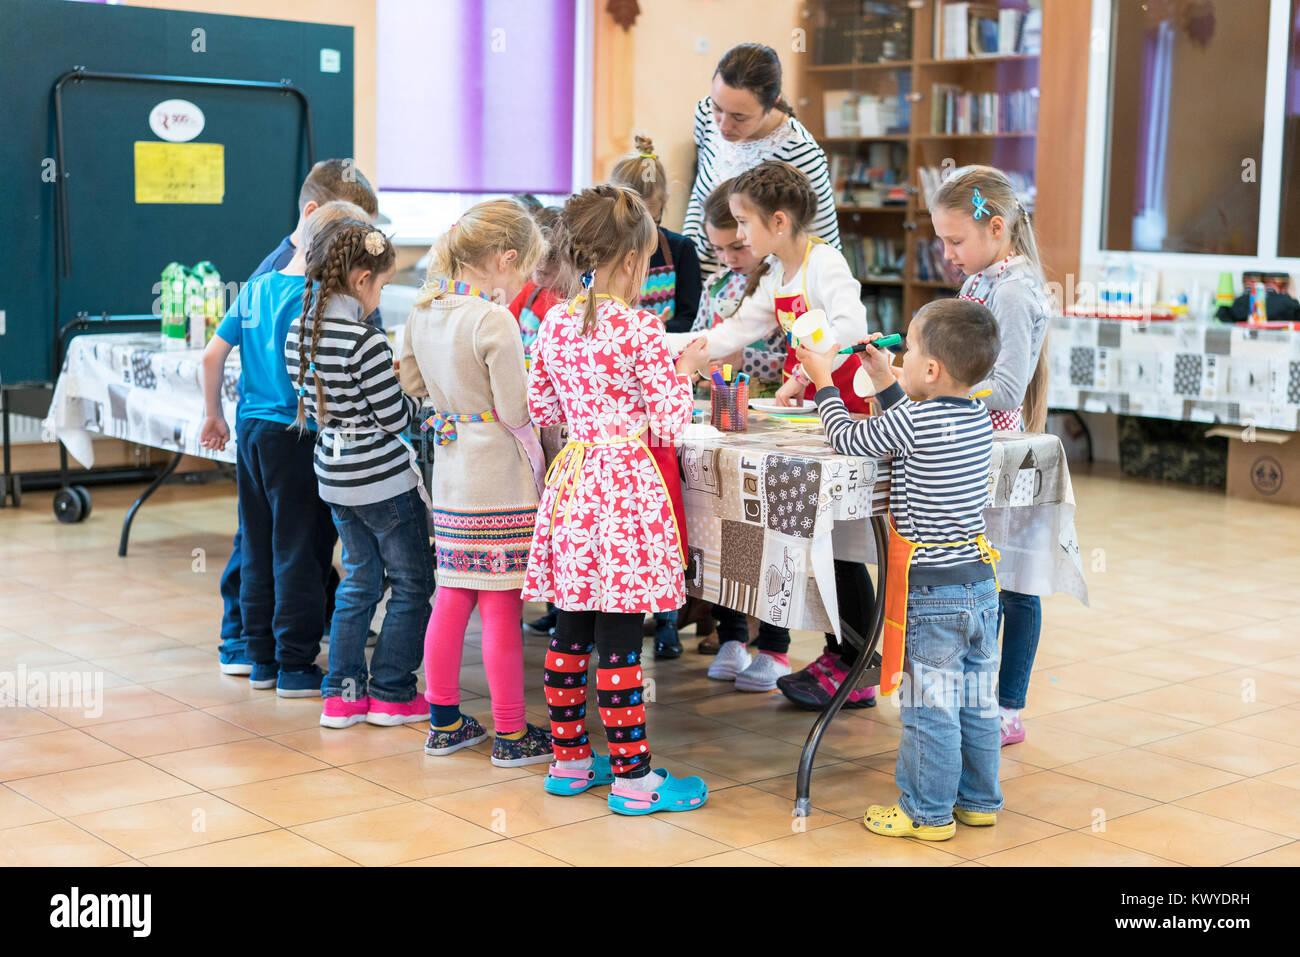 Kiev, Ukraine. November 13 2017. Schoolchildren and a teacher in a drawing class - Stock Image